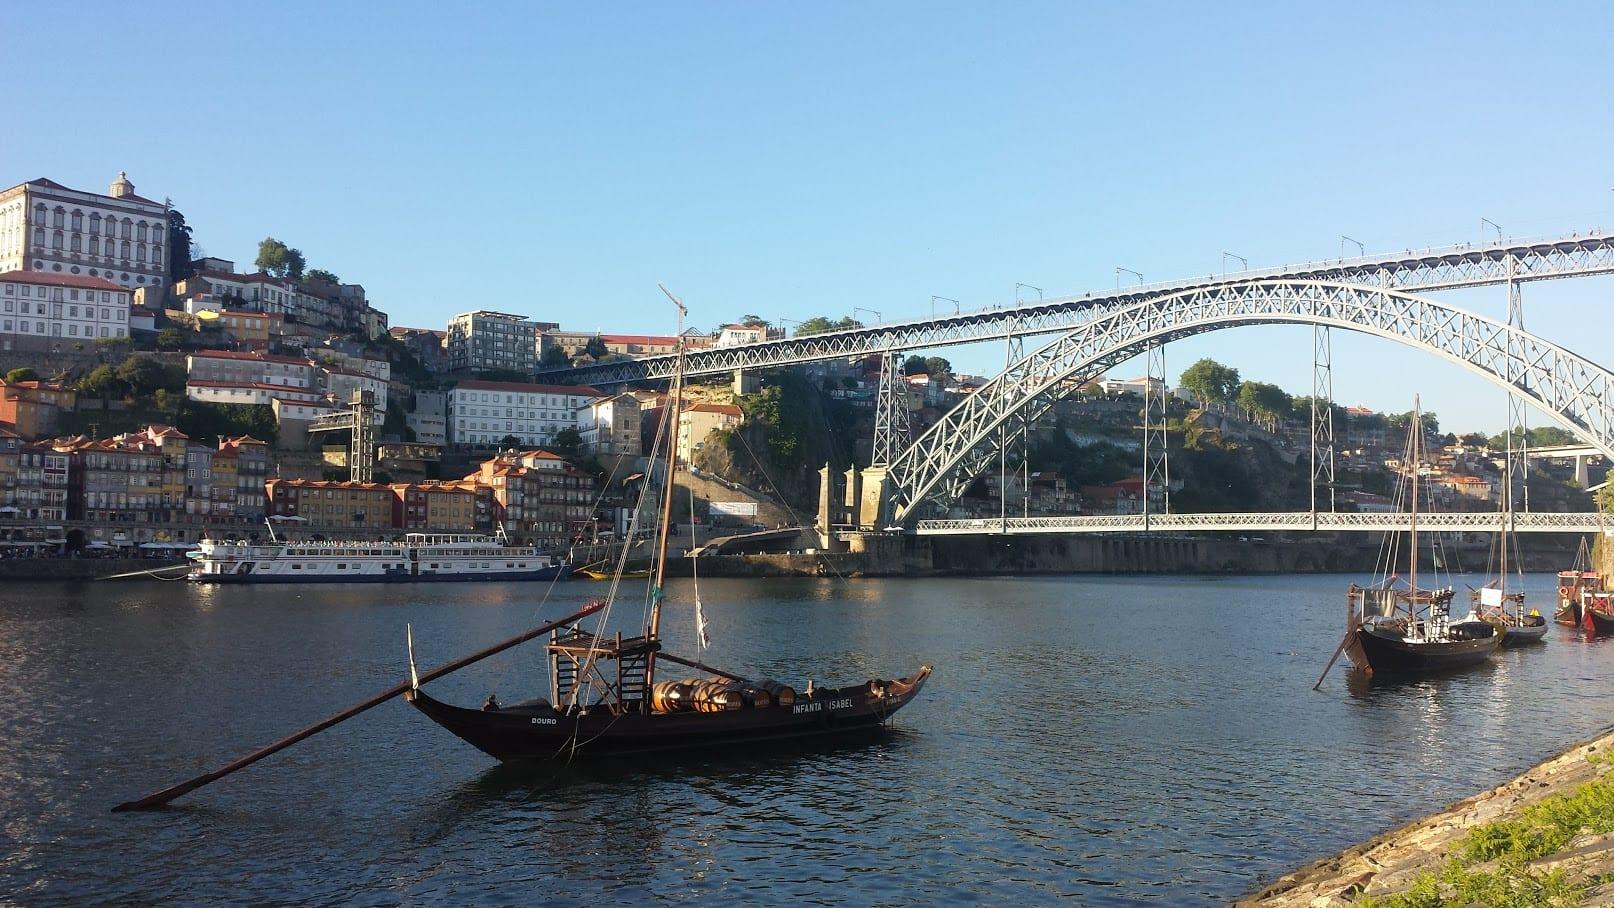 River walk in Porto